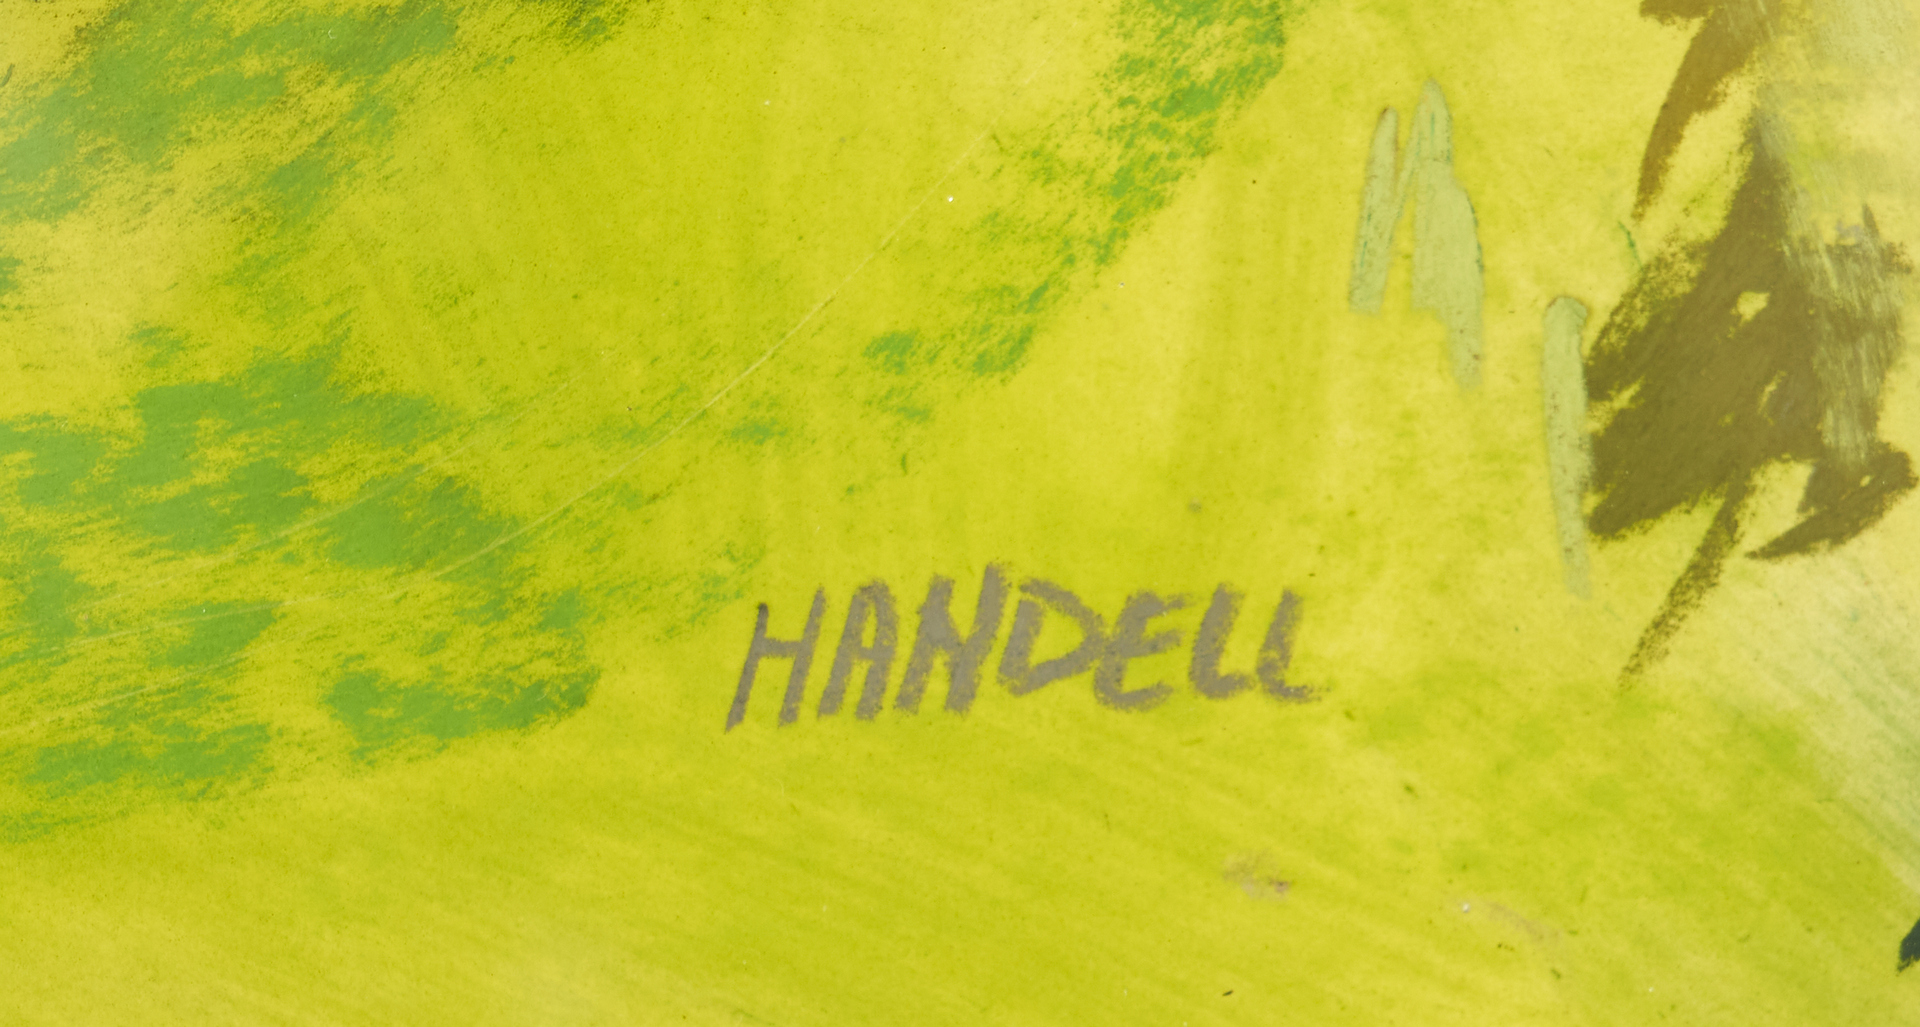 Lot 1013: Albert Handell Pastel Study of a Tree